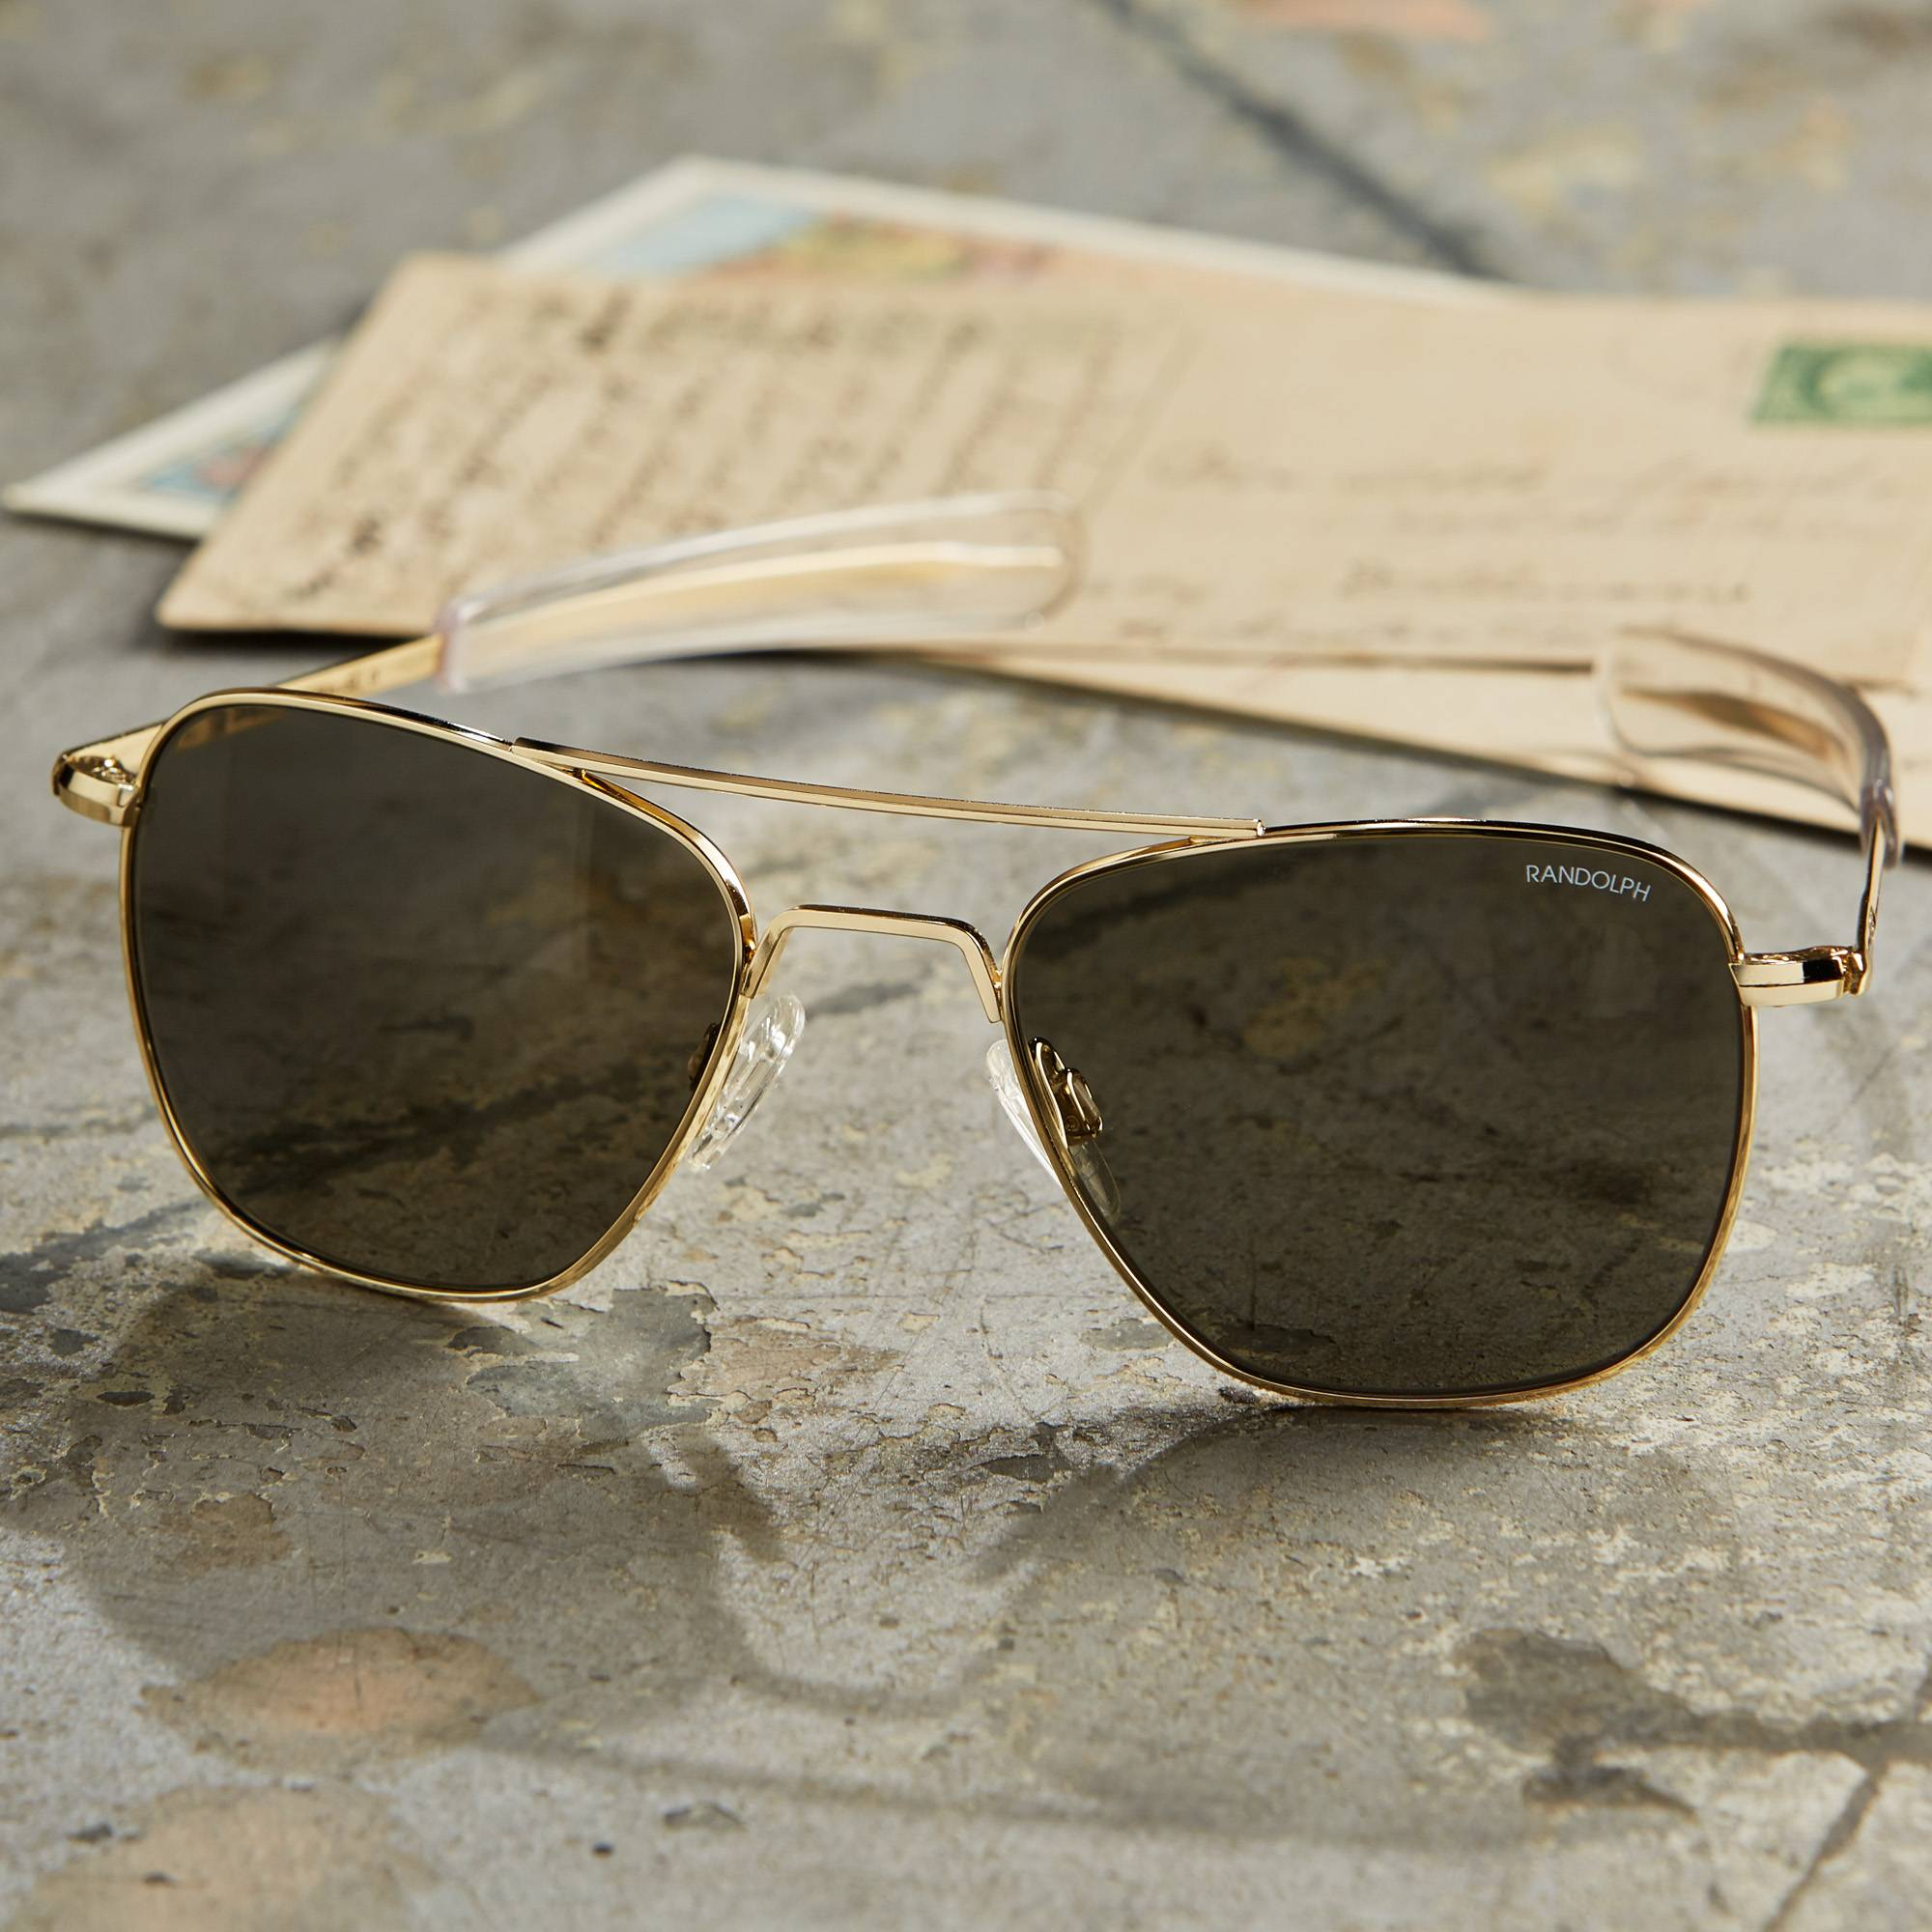 5e6a564e216 Authentic Aviator Sunglasses-Polarized Lenses - Classic Aviator